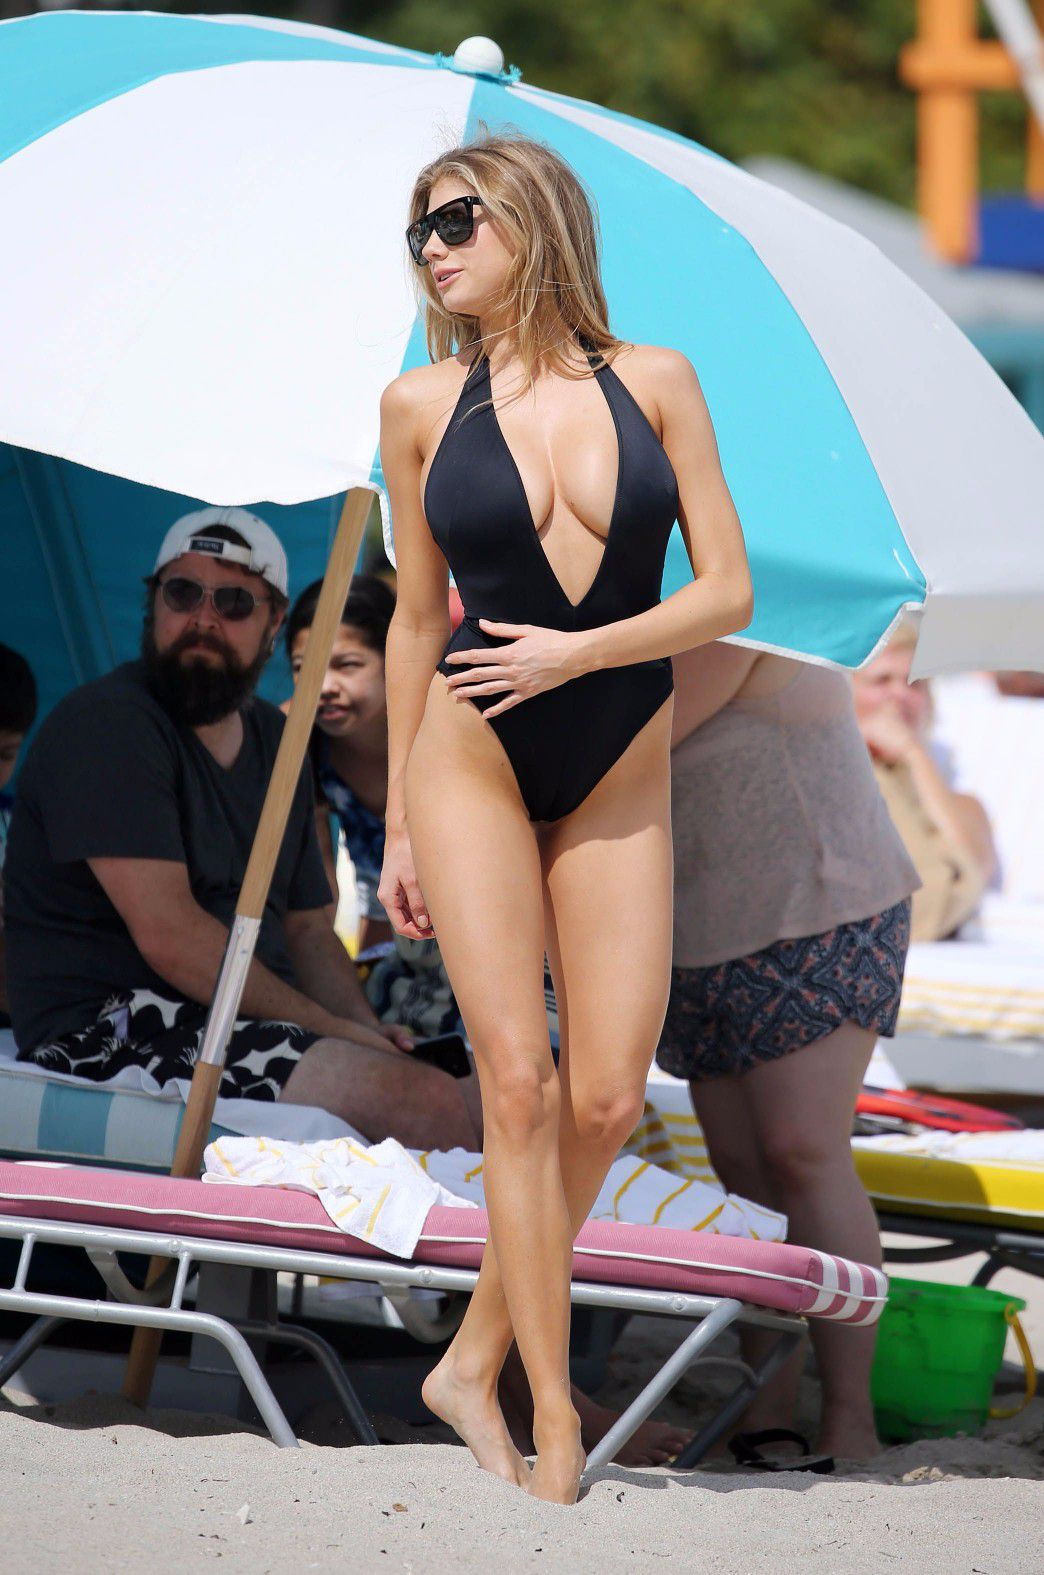 charlotte-mckinney-nipple-slip-at-the-beach-in-miami-07